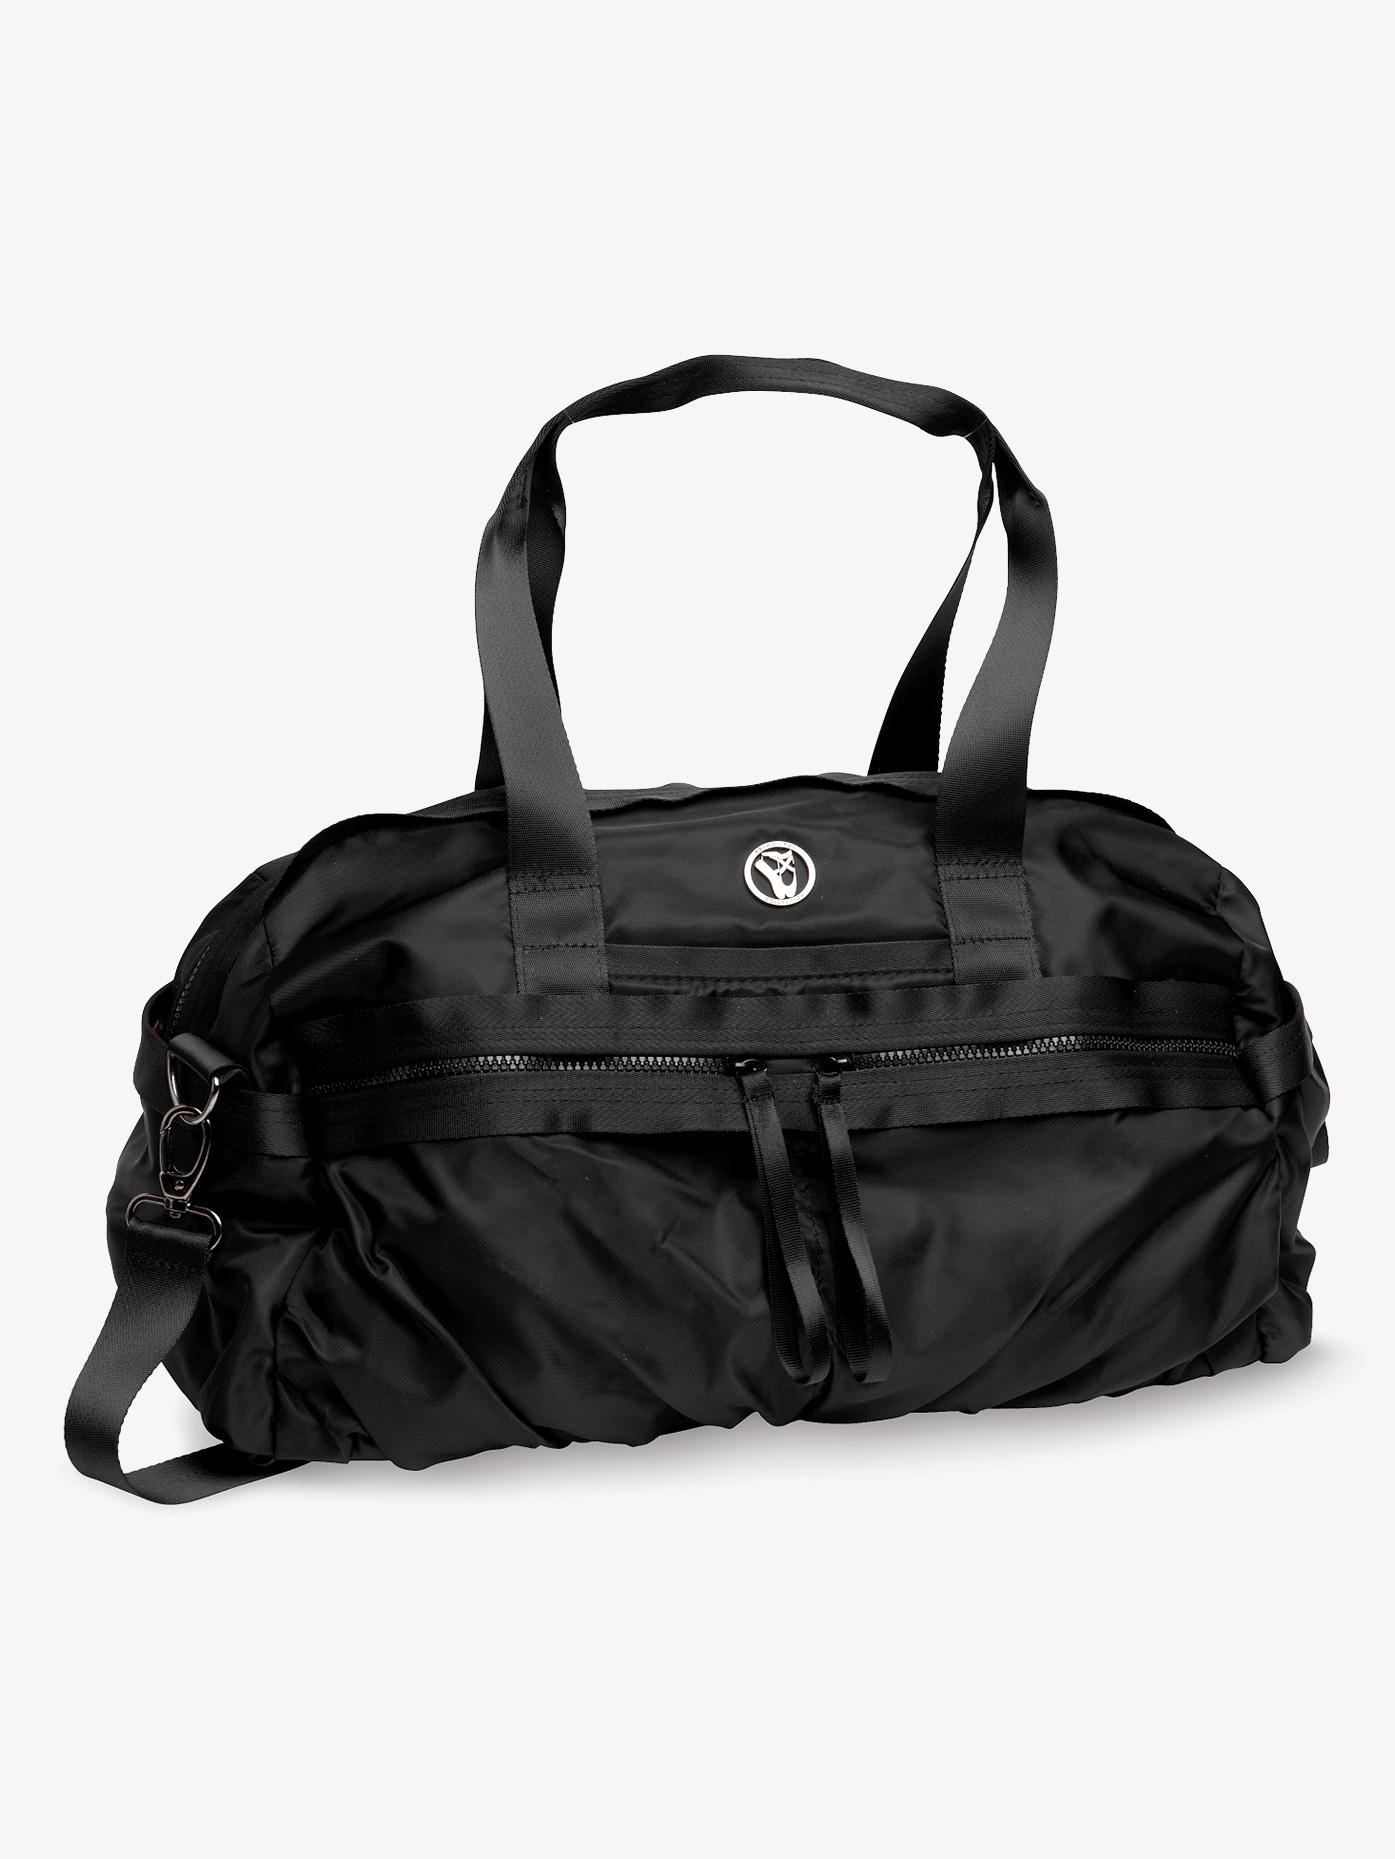 DansBagz Chasse Principal Duffle Bag BPC04